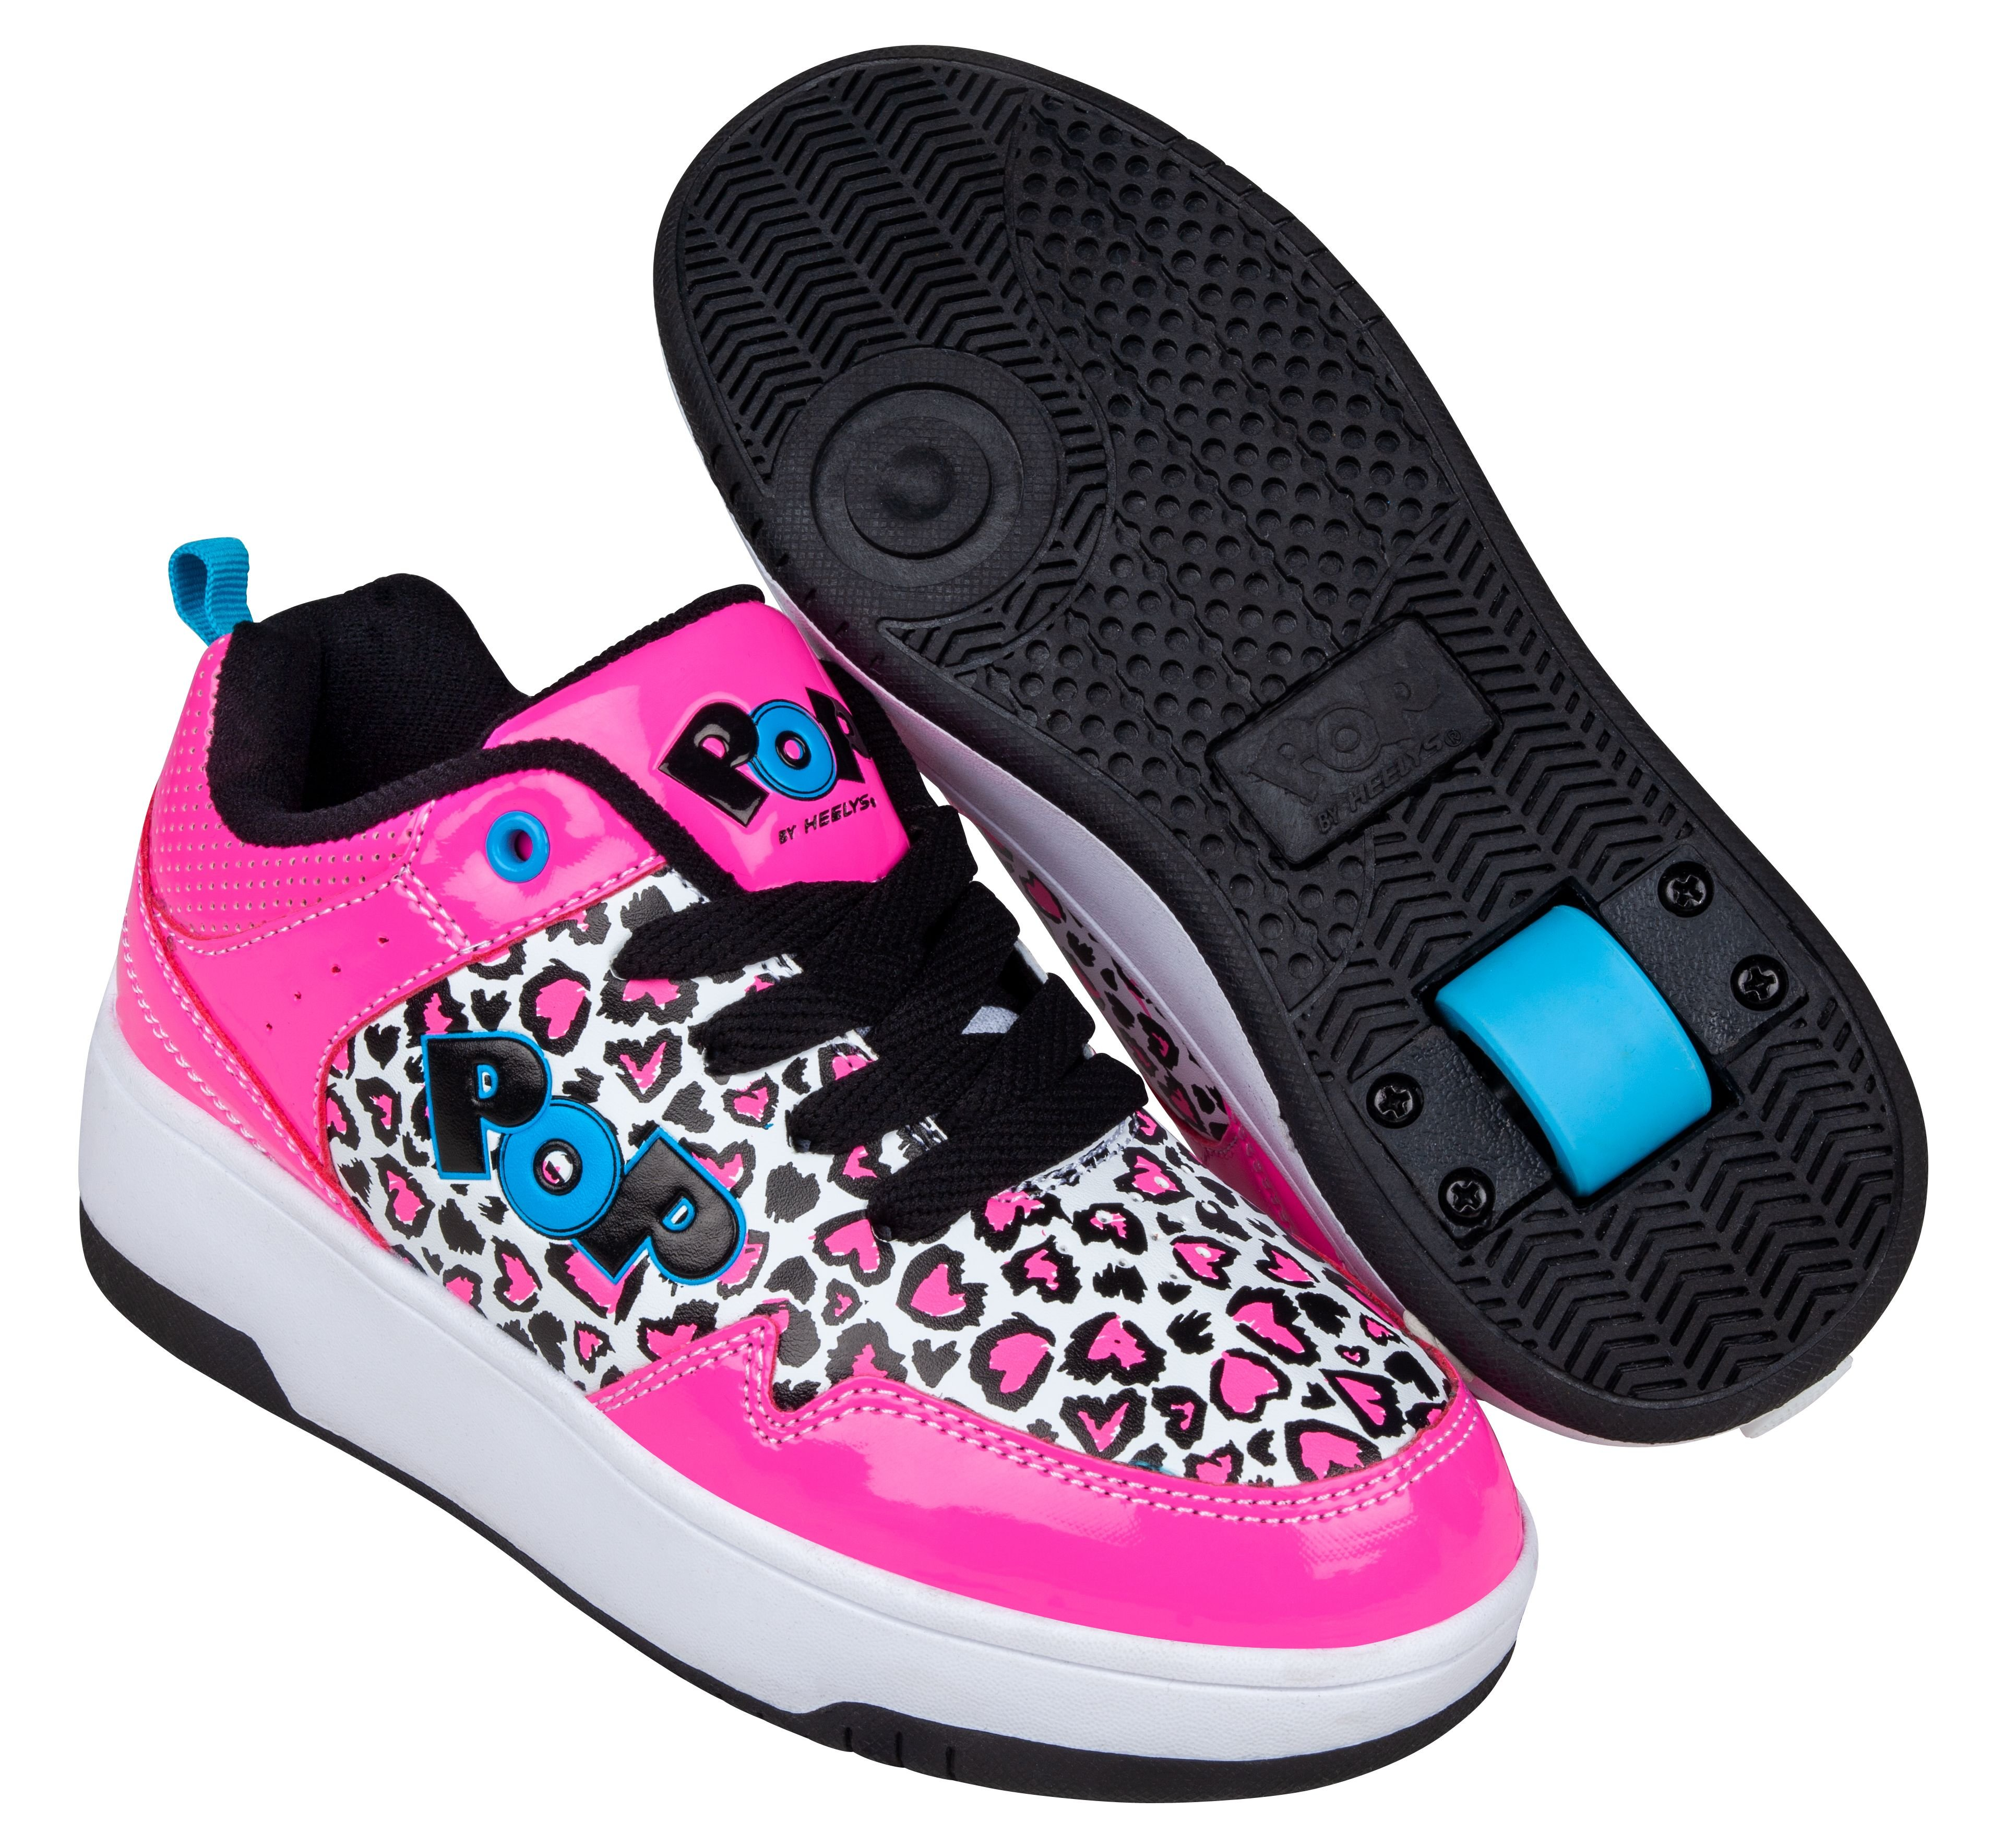 Heelys POP Shoes - Neon Pink (size 34) (POP-G1W-0059)